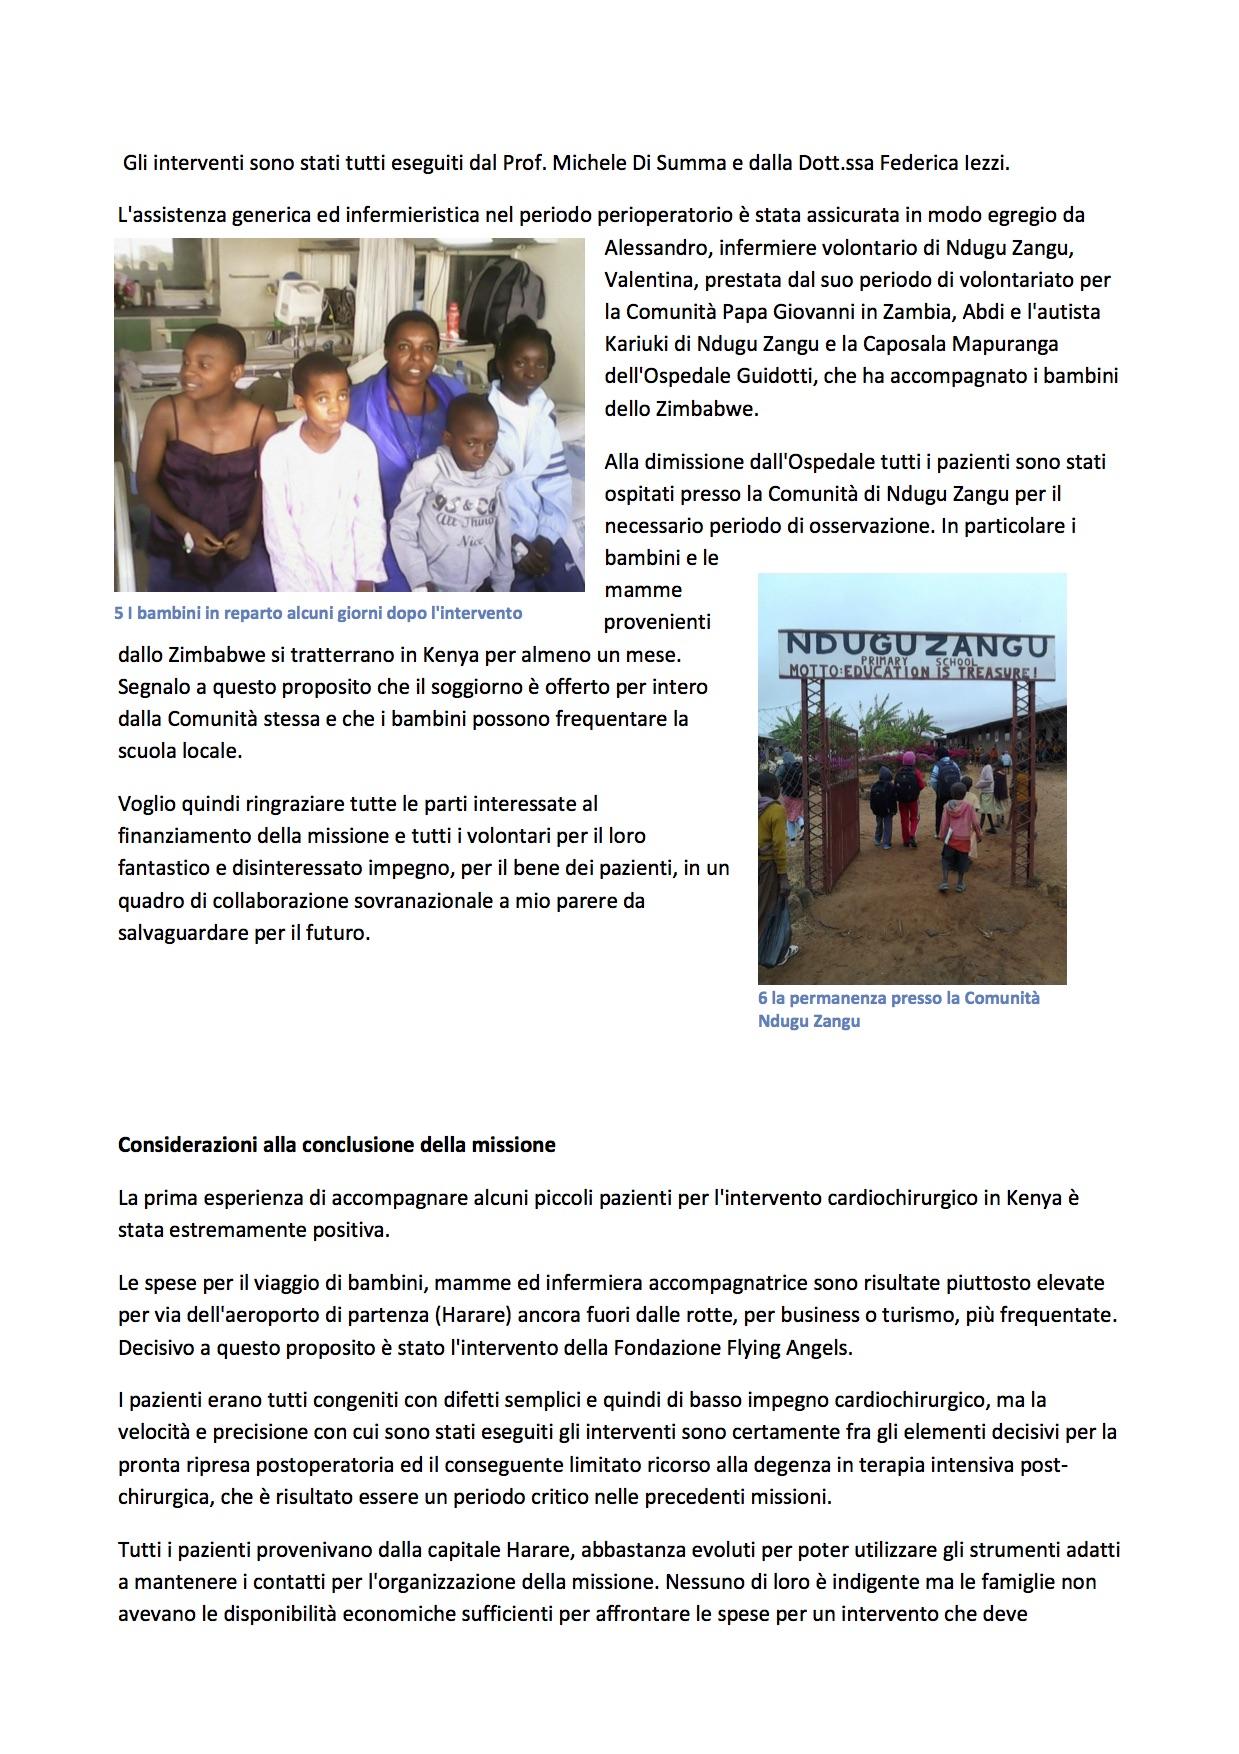 1Kenya Mar 2015 Cardiosurgery Mission